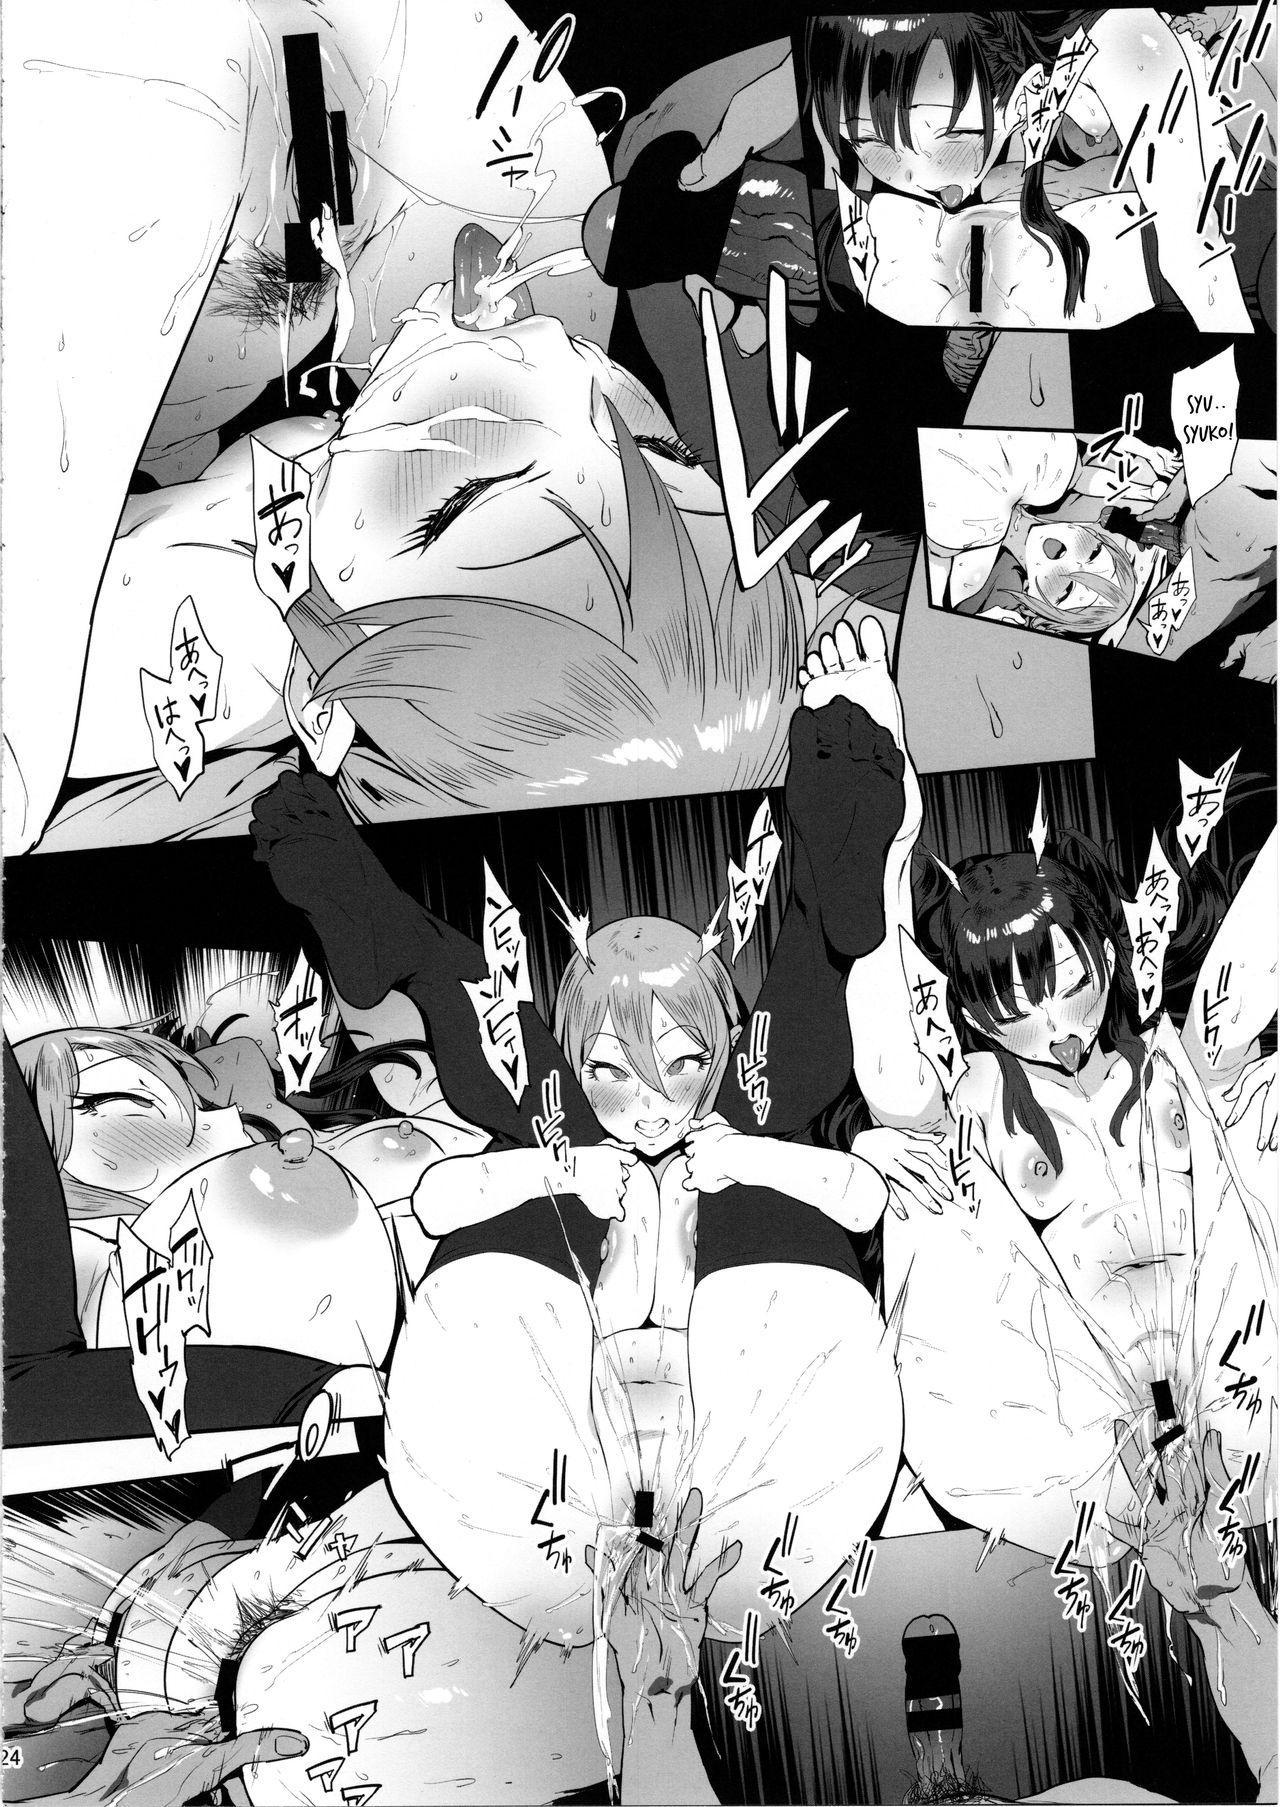 Himegoto Komachi 22